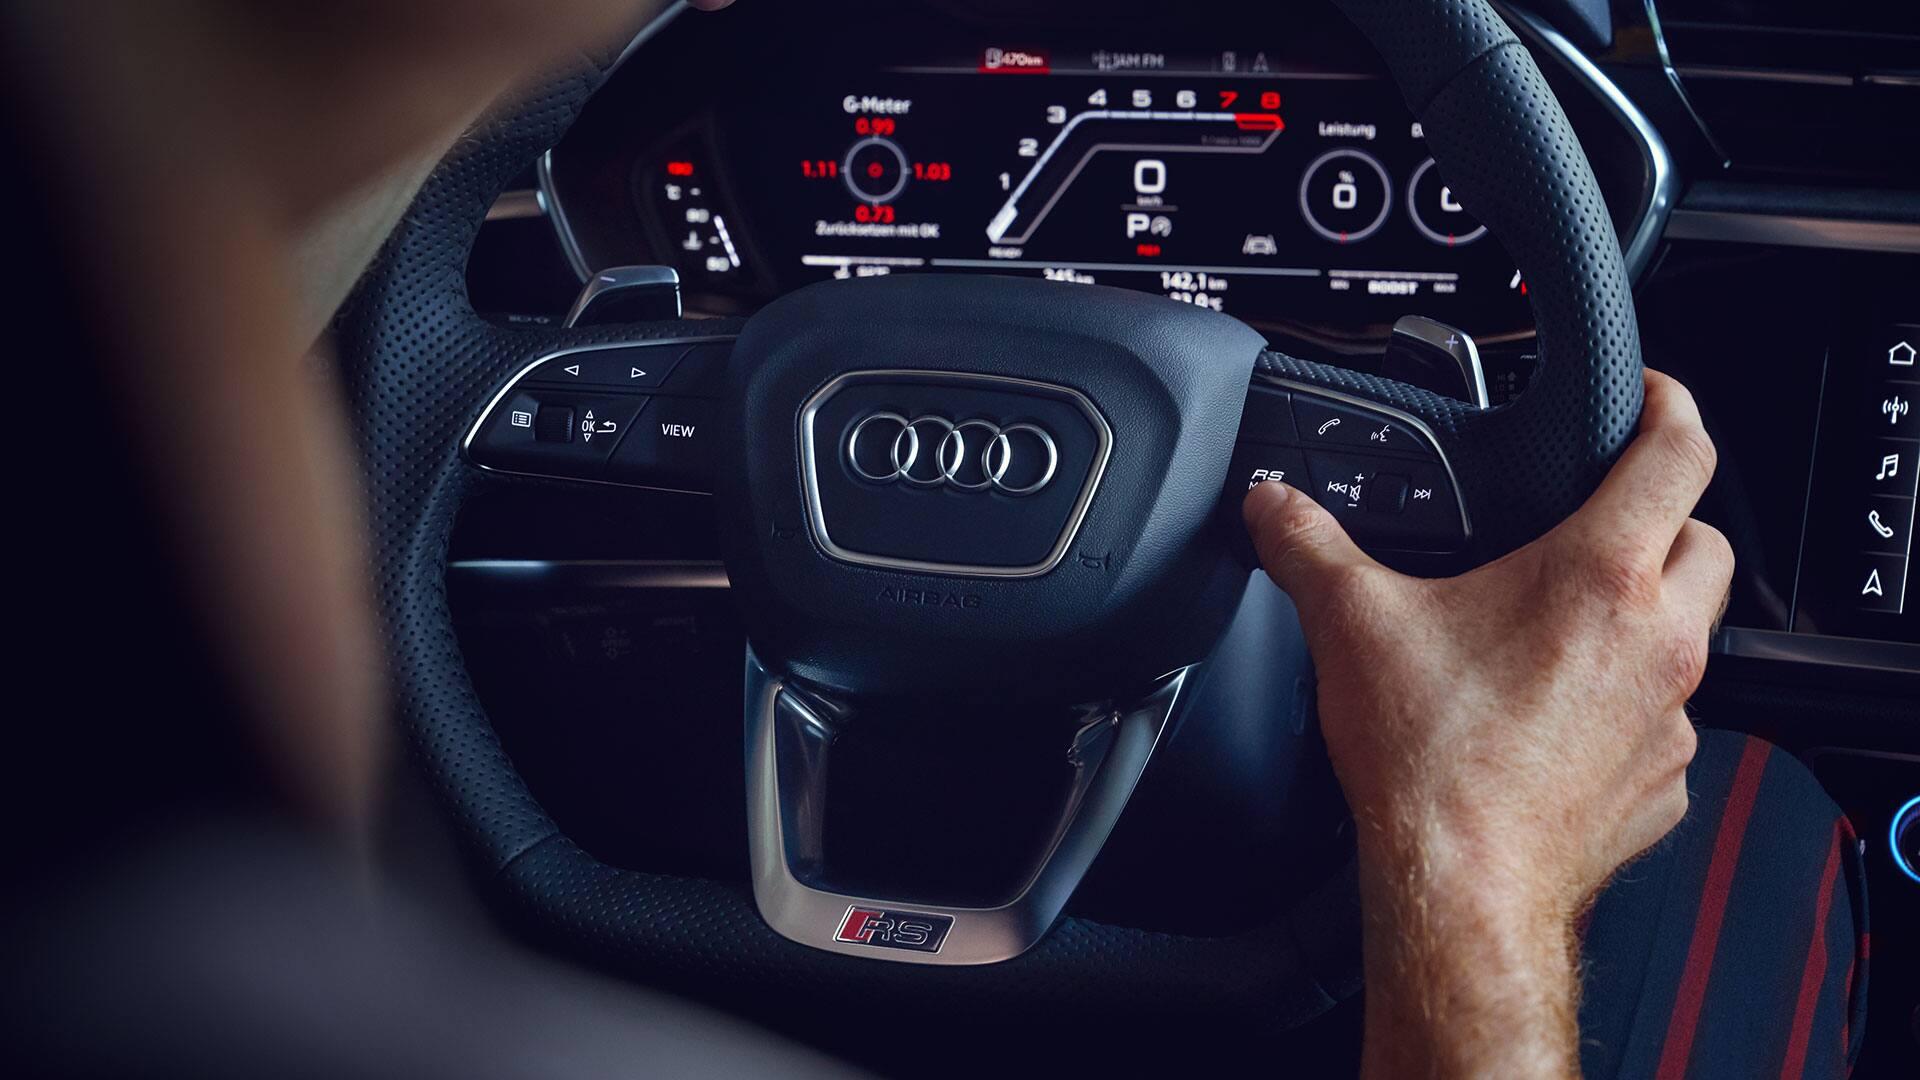 Audi virtual cockpit im Audi RS Q3 Sportback